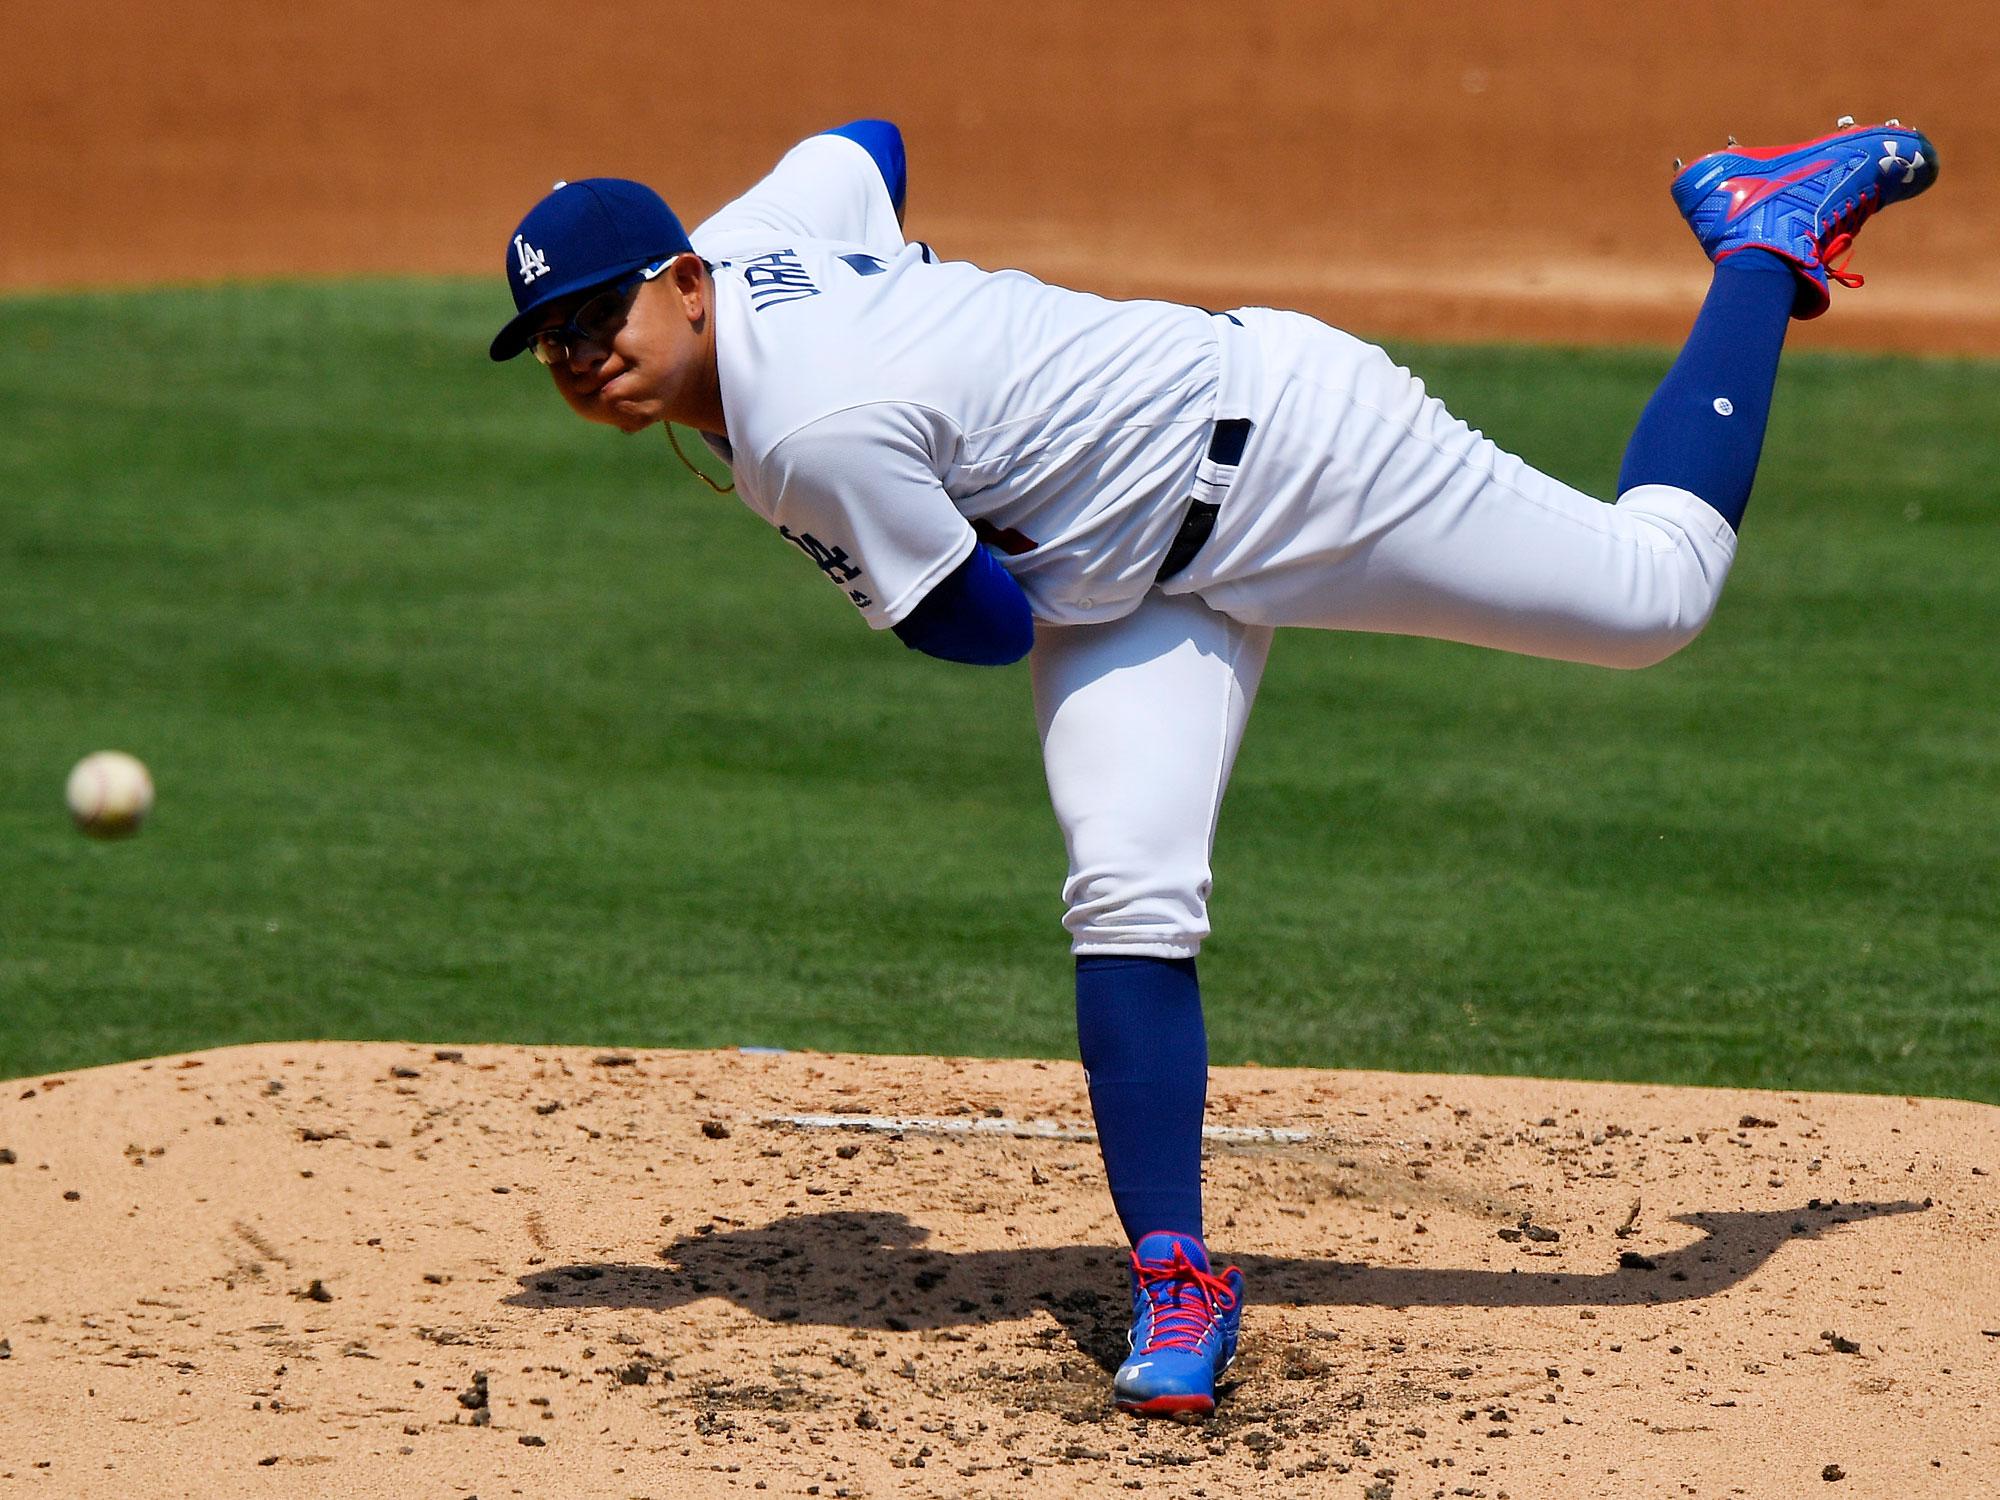 Julio Urias, Los Angeles Dodgers